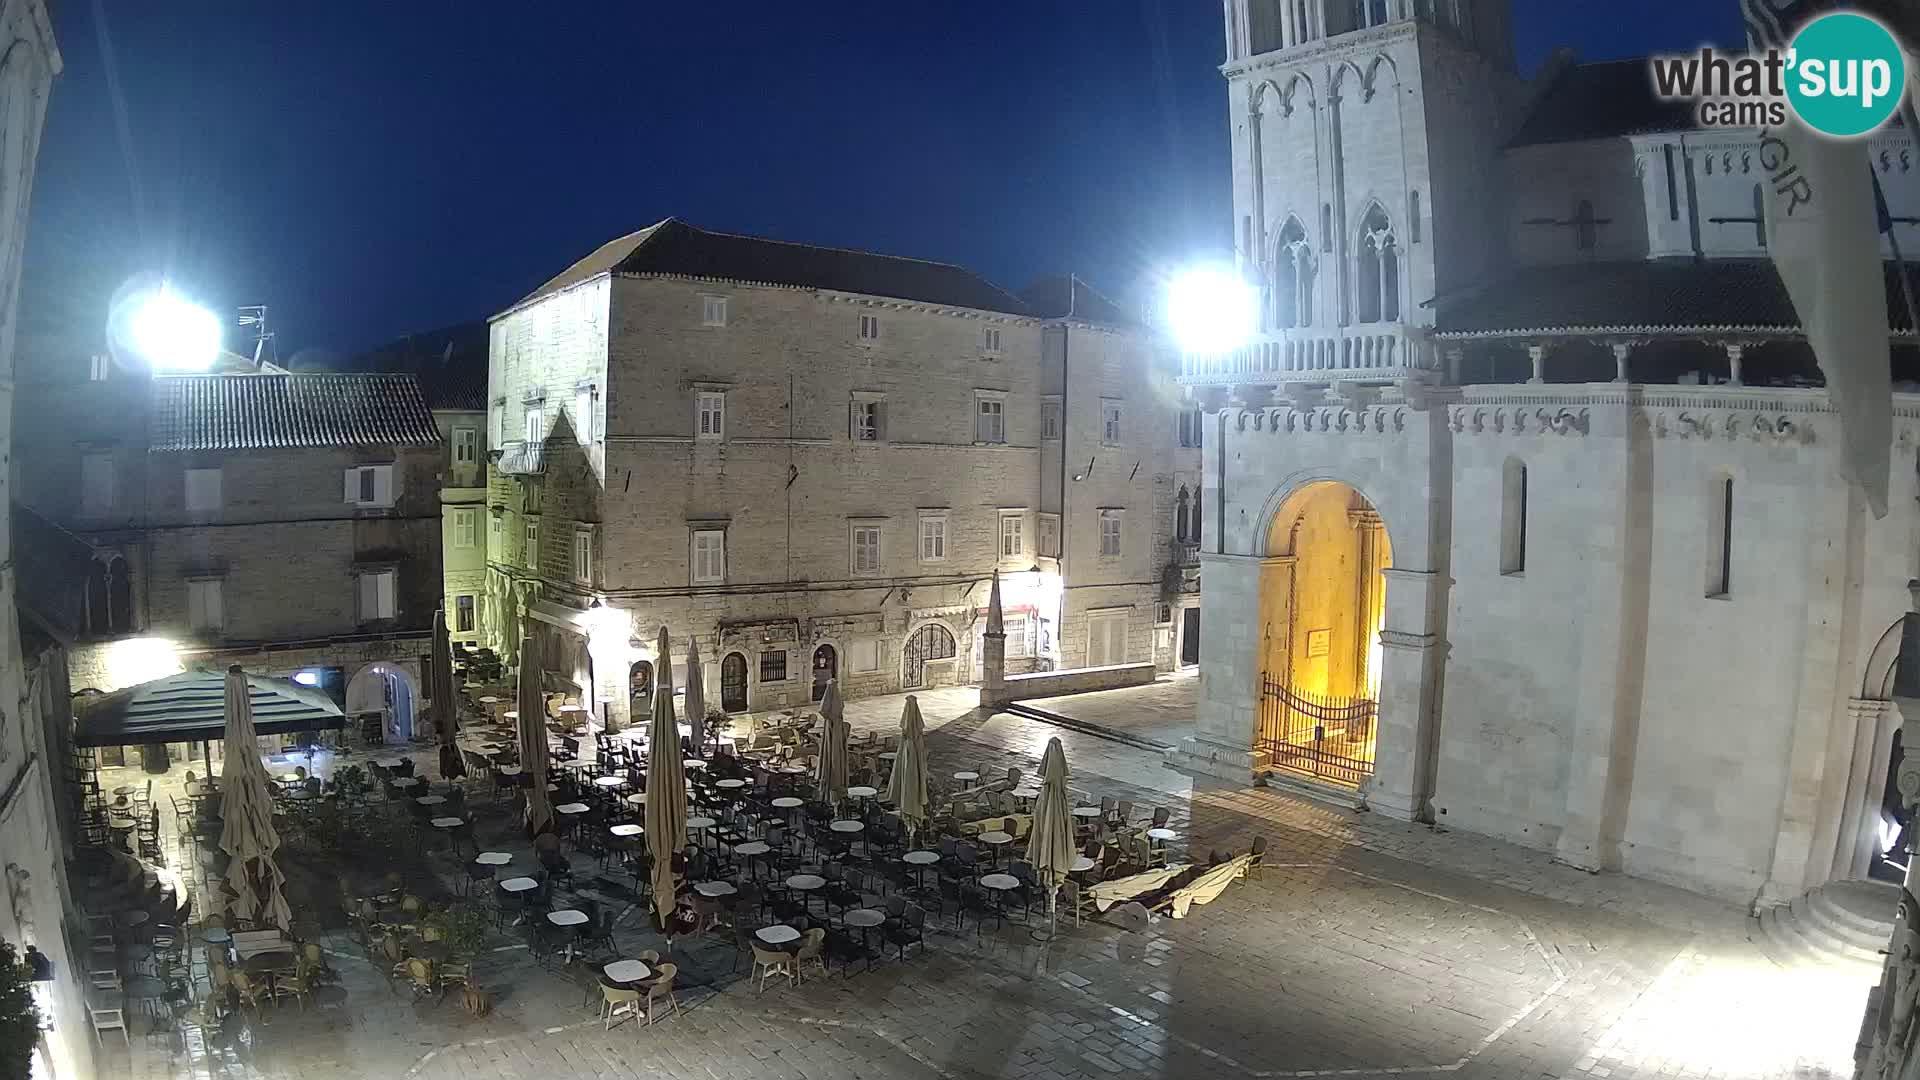 Cámara web en vivo Trogir – Catedral de San Lorenzo – Livecam Croacia